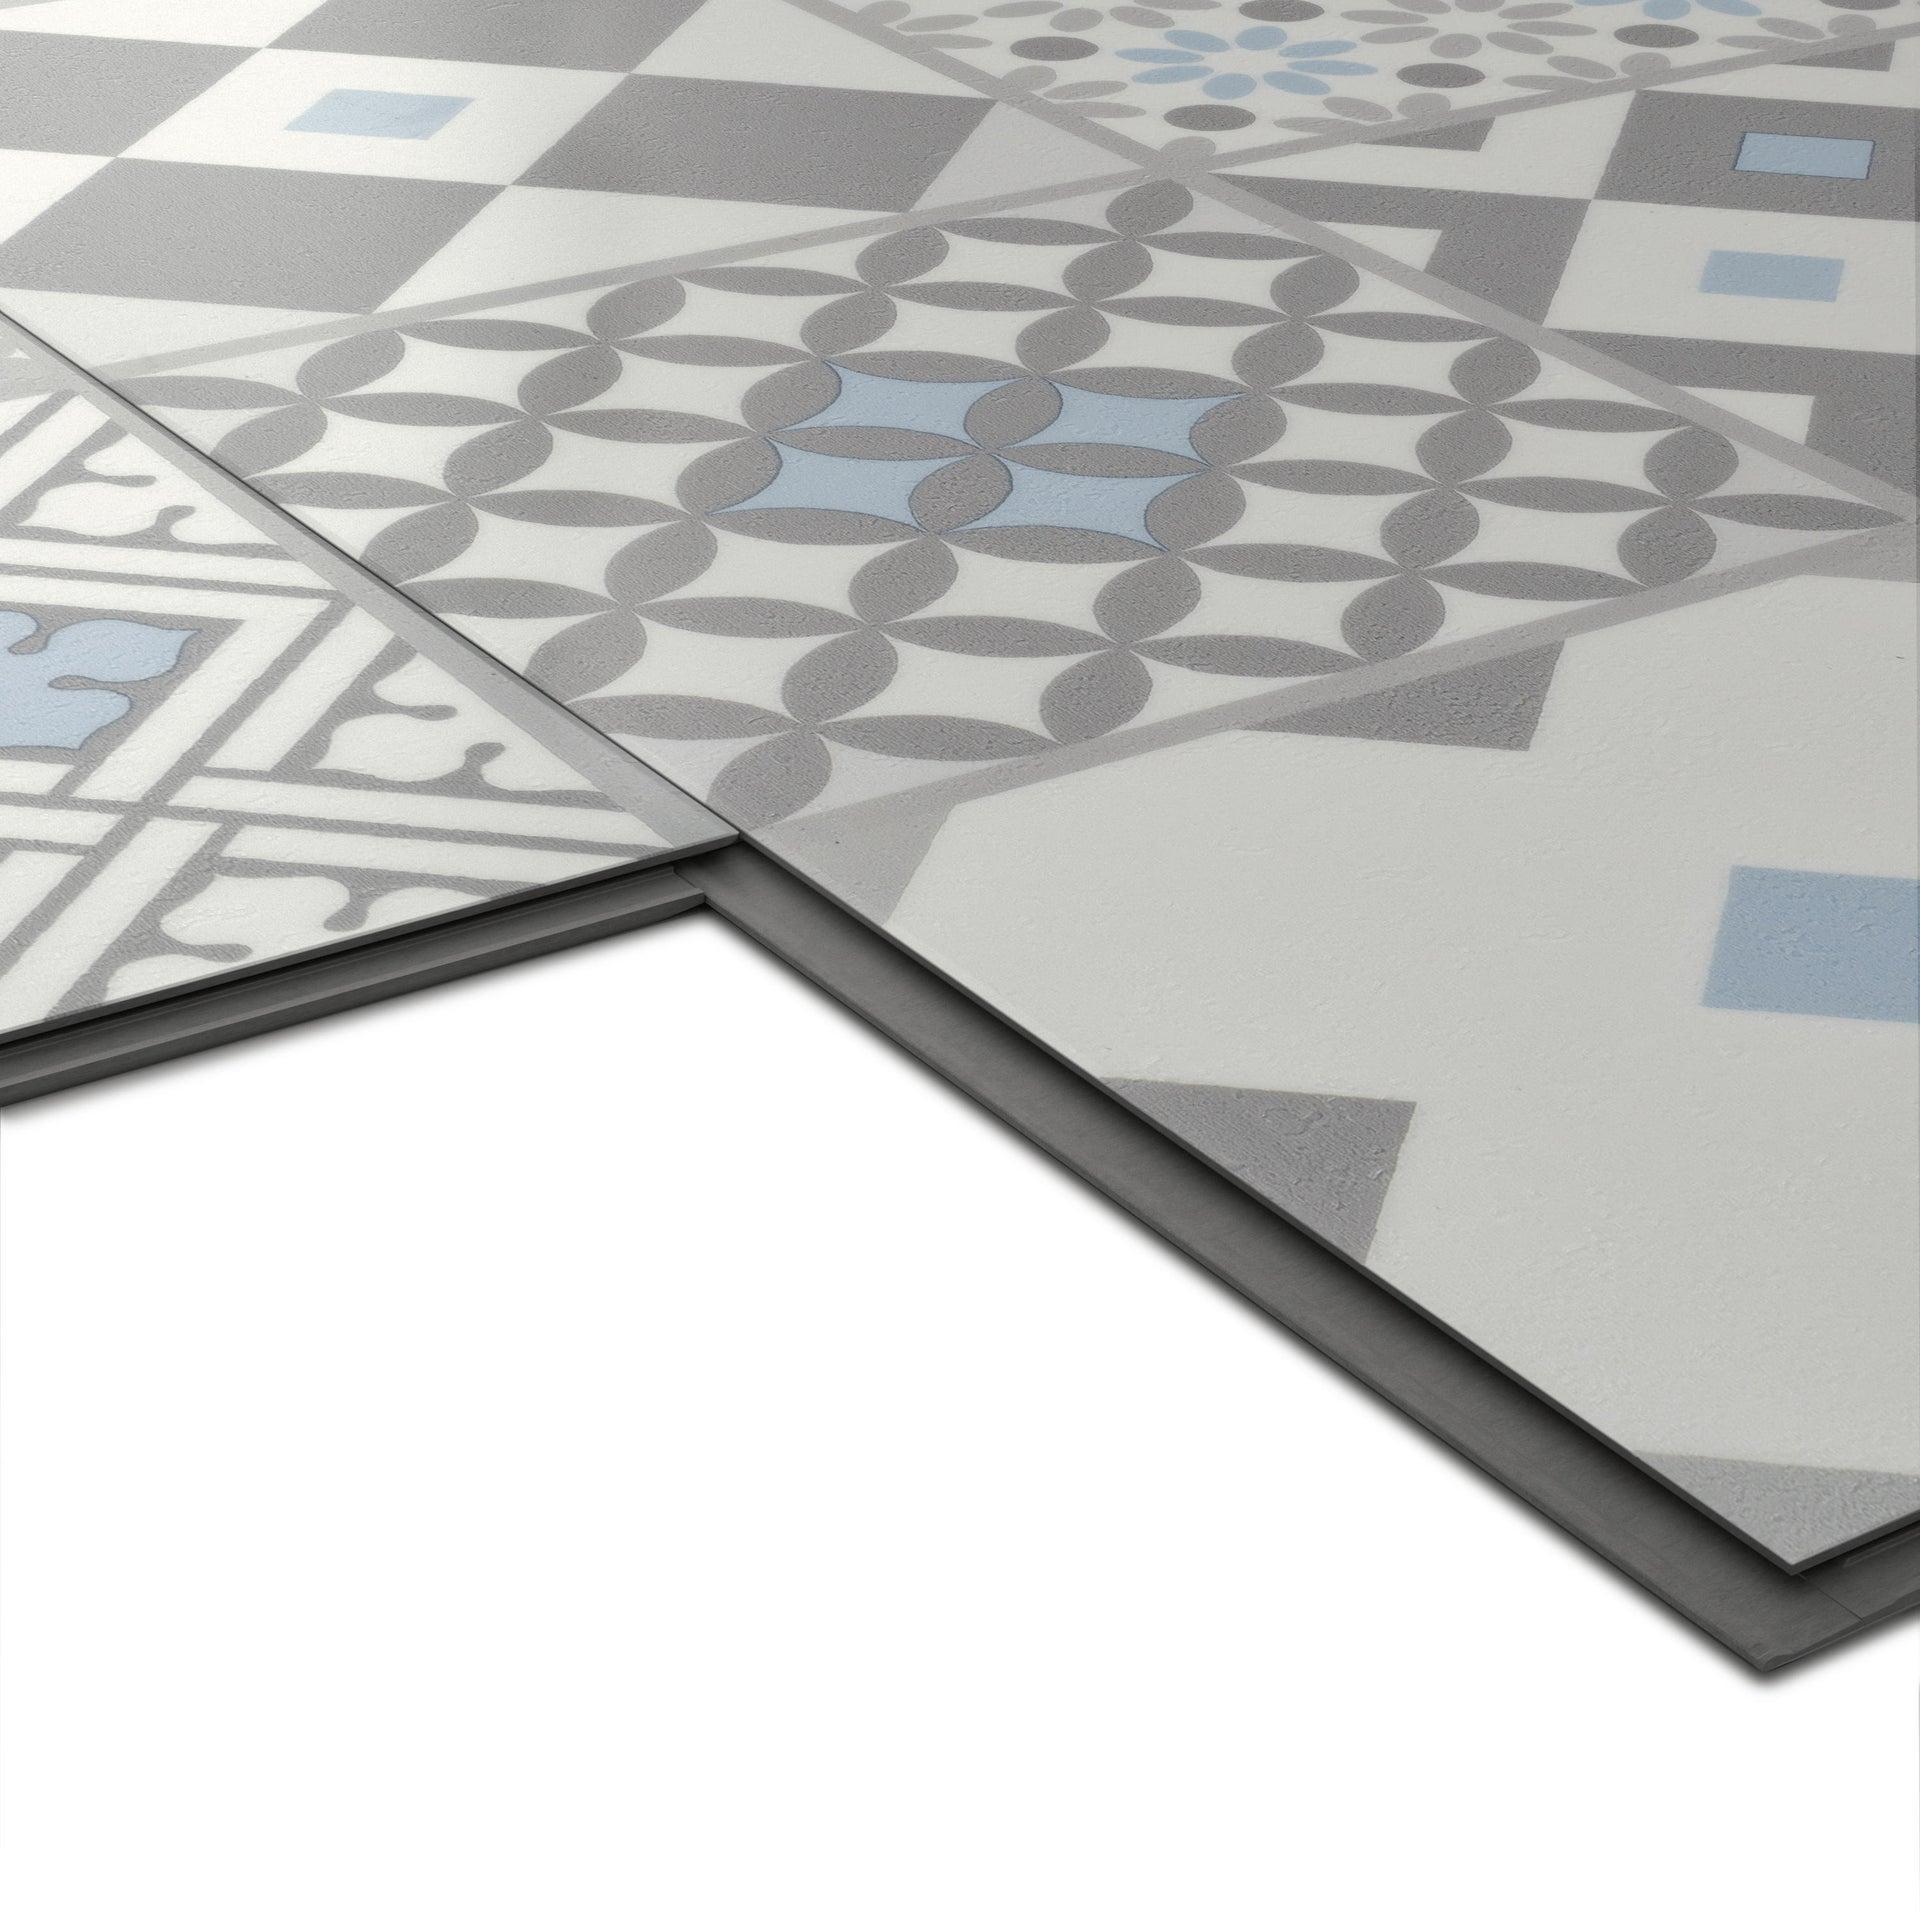 Pavimento PVC flottante clic+ Gatsby Blu Sp 4.2 mm multicolore - 8